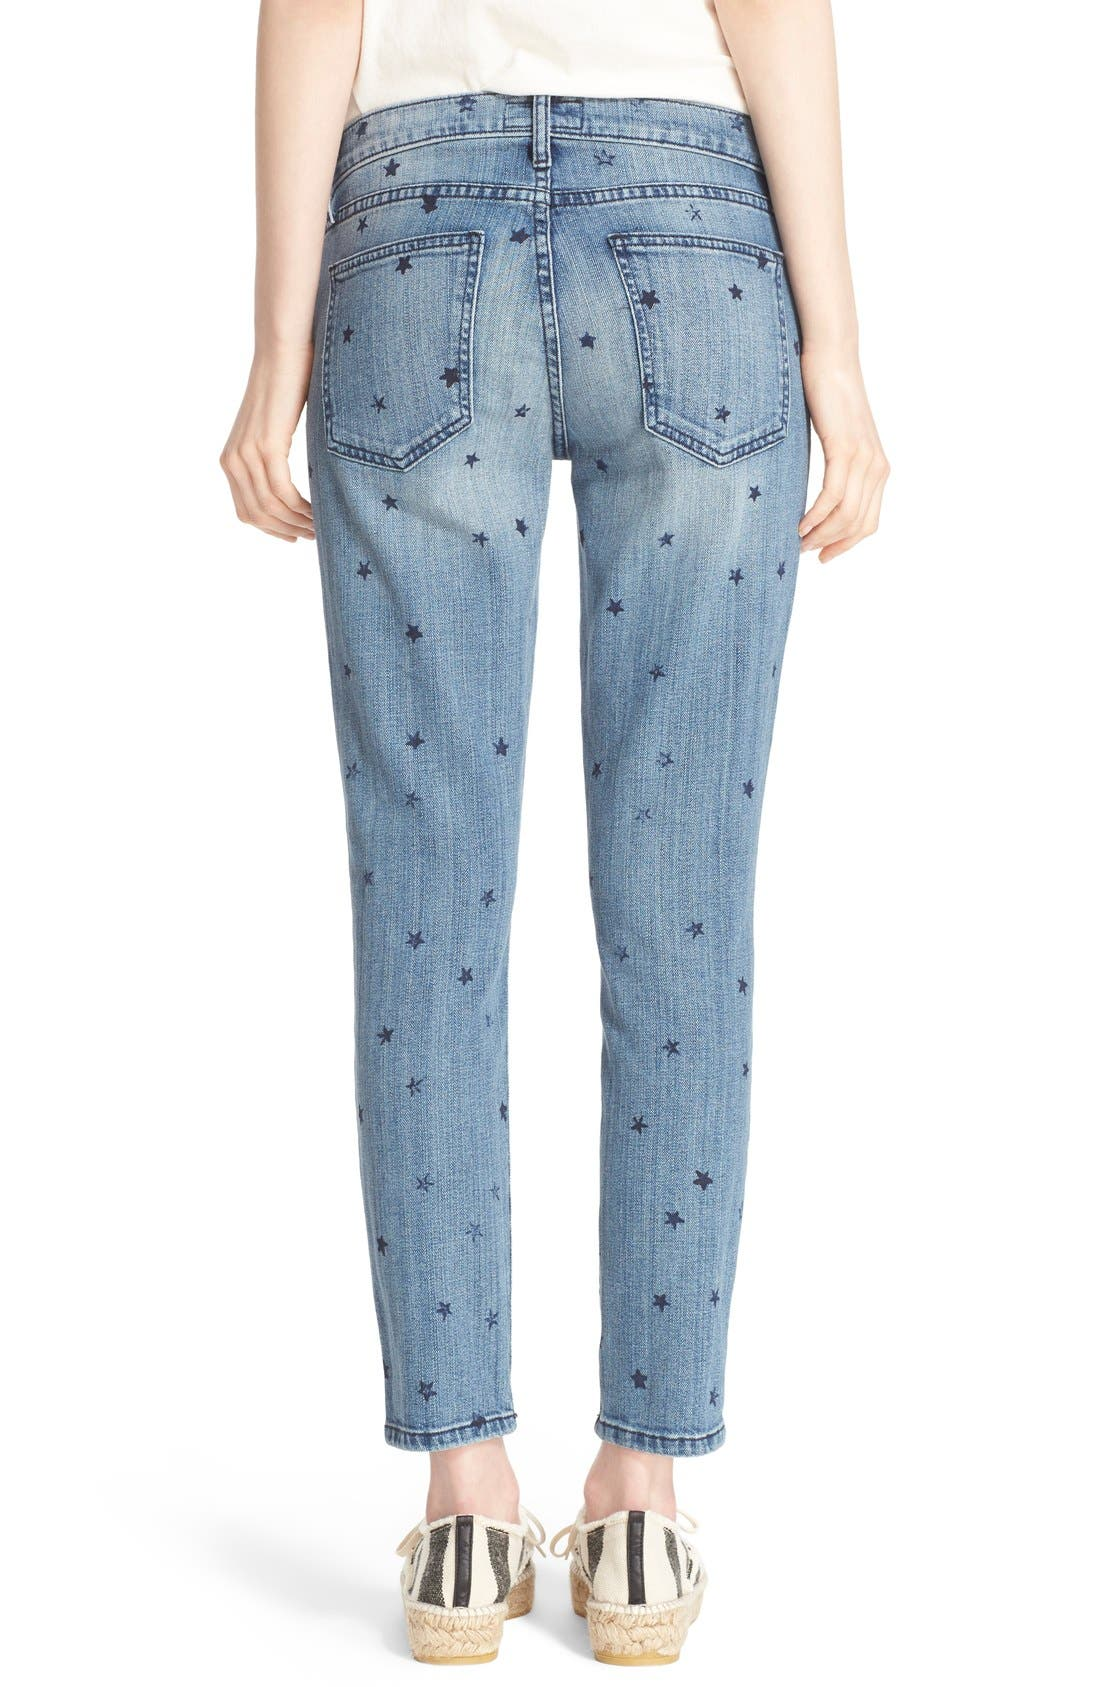 Alternate Image 2  - Current/Elliott 'The Stiletto' Star Print Skinny Jeans (Revival with Mini Navy Stars)